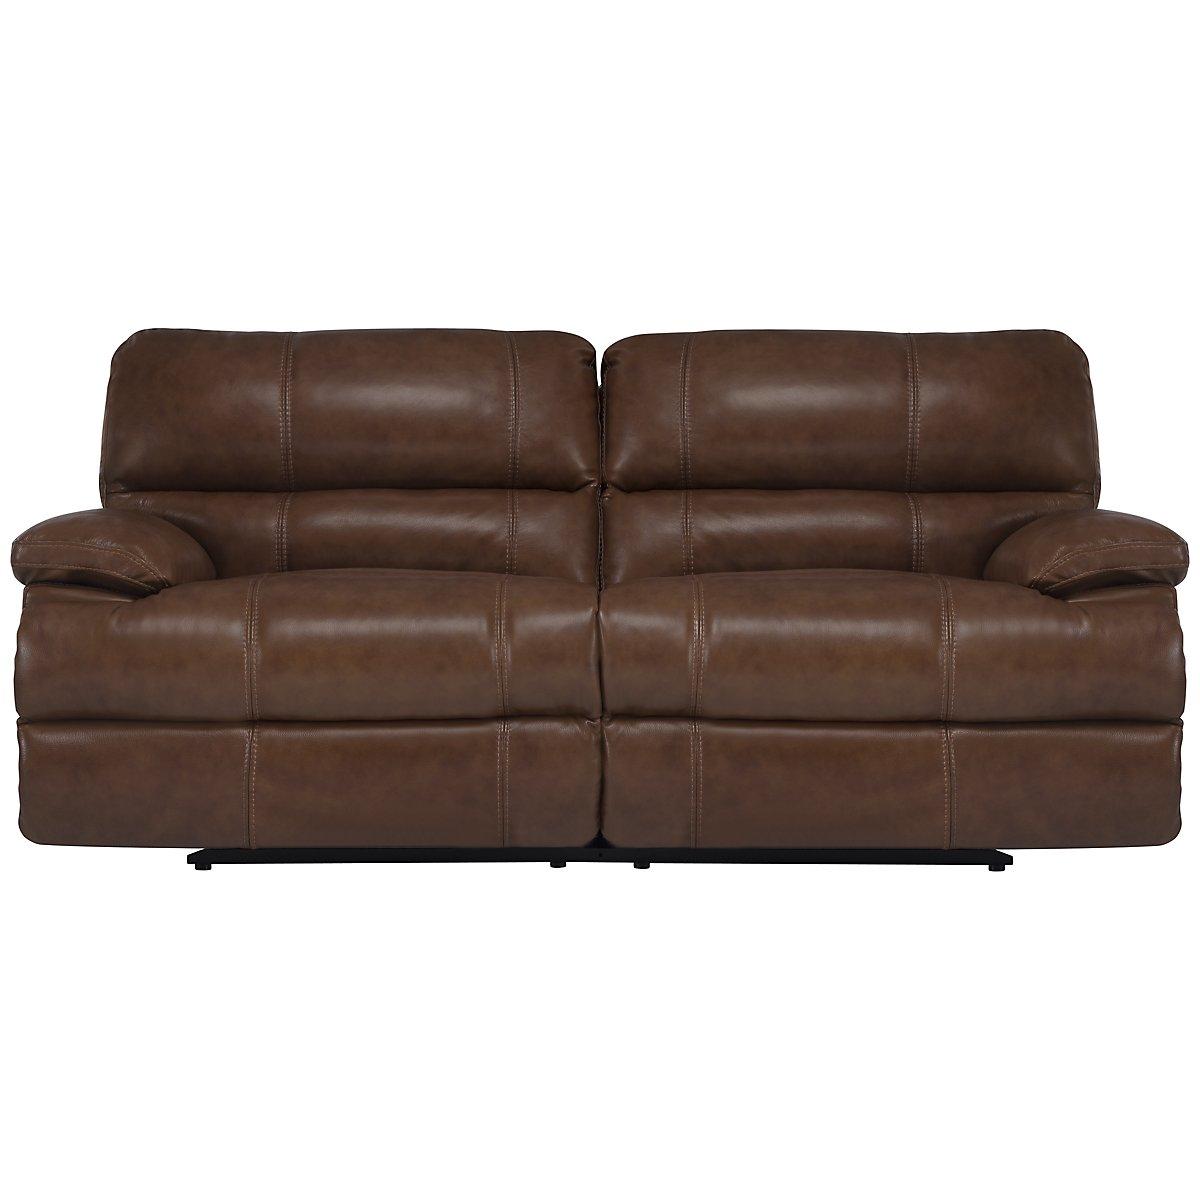 Alton2 Medium Brown Leather & Vinyl Power Reclining Sofa